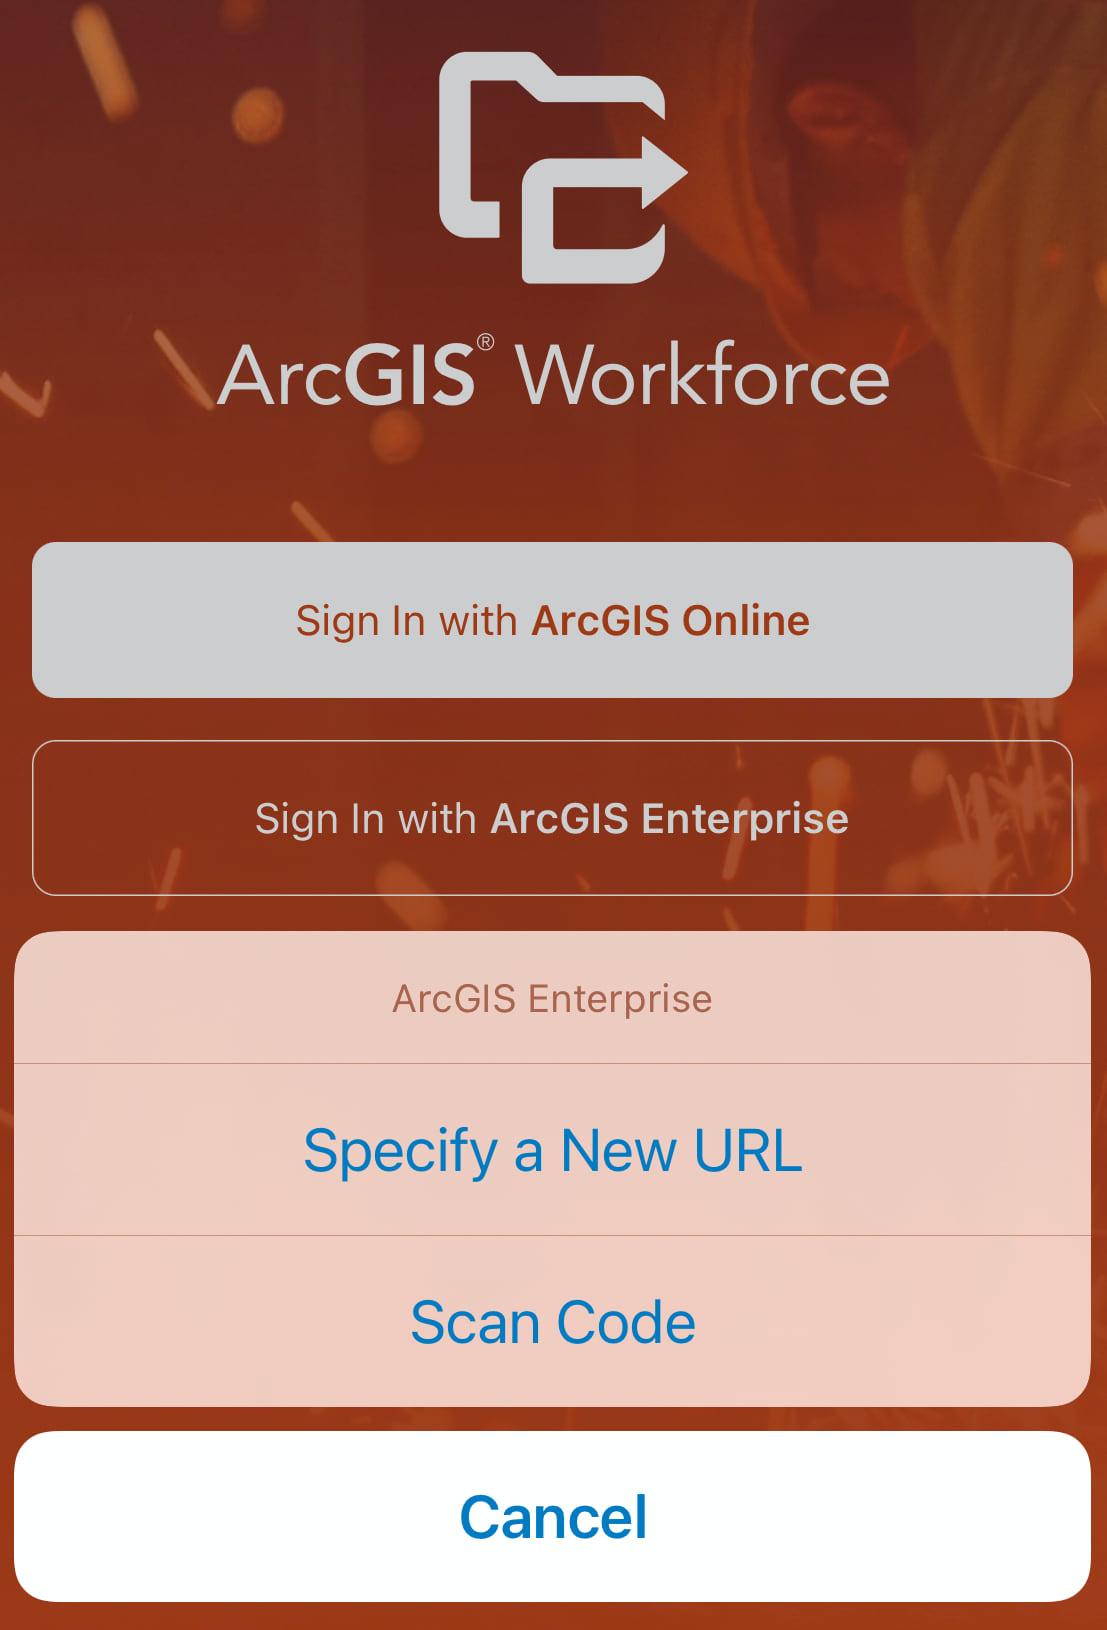 Sign into ArcGIS Enterprise